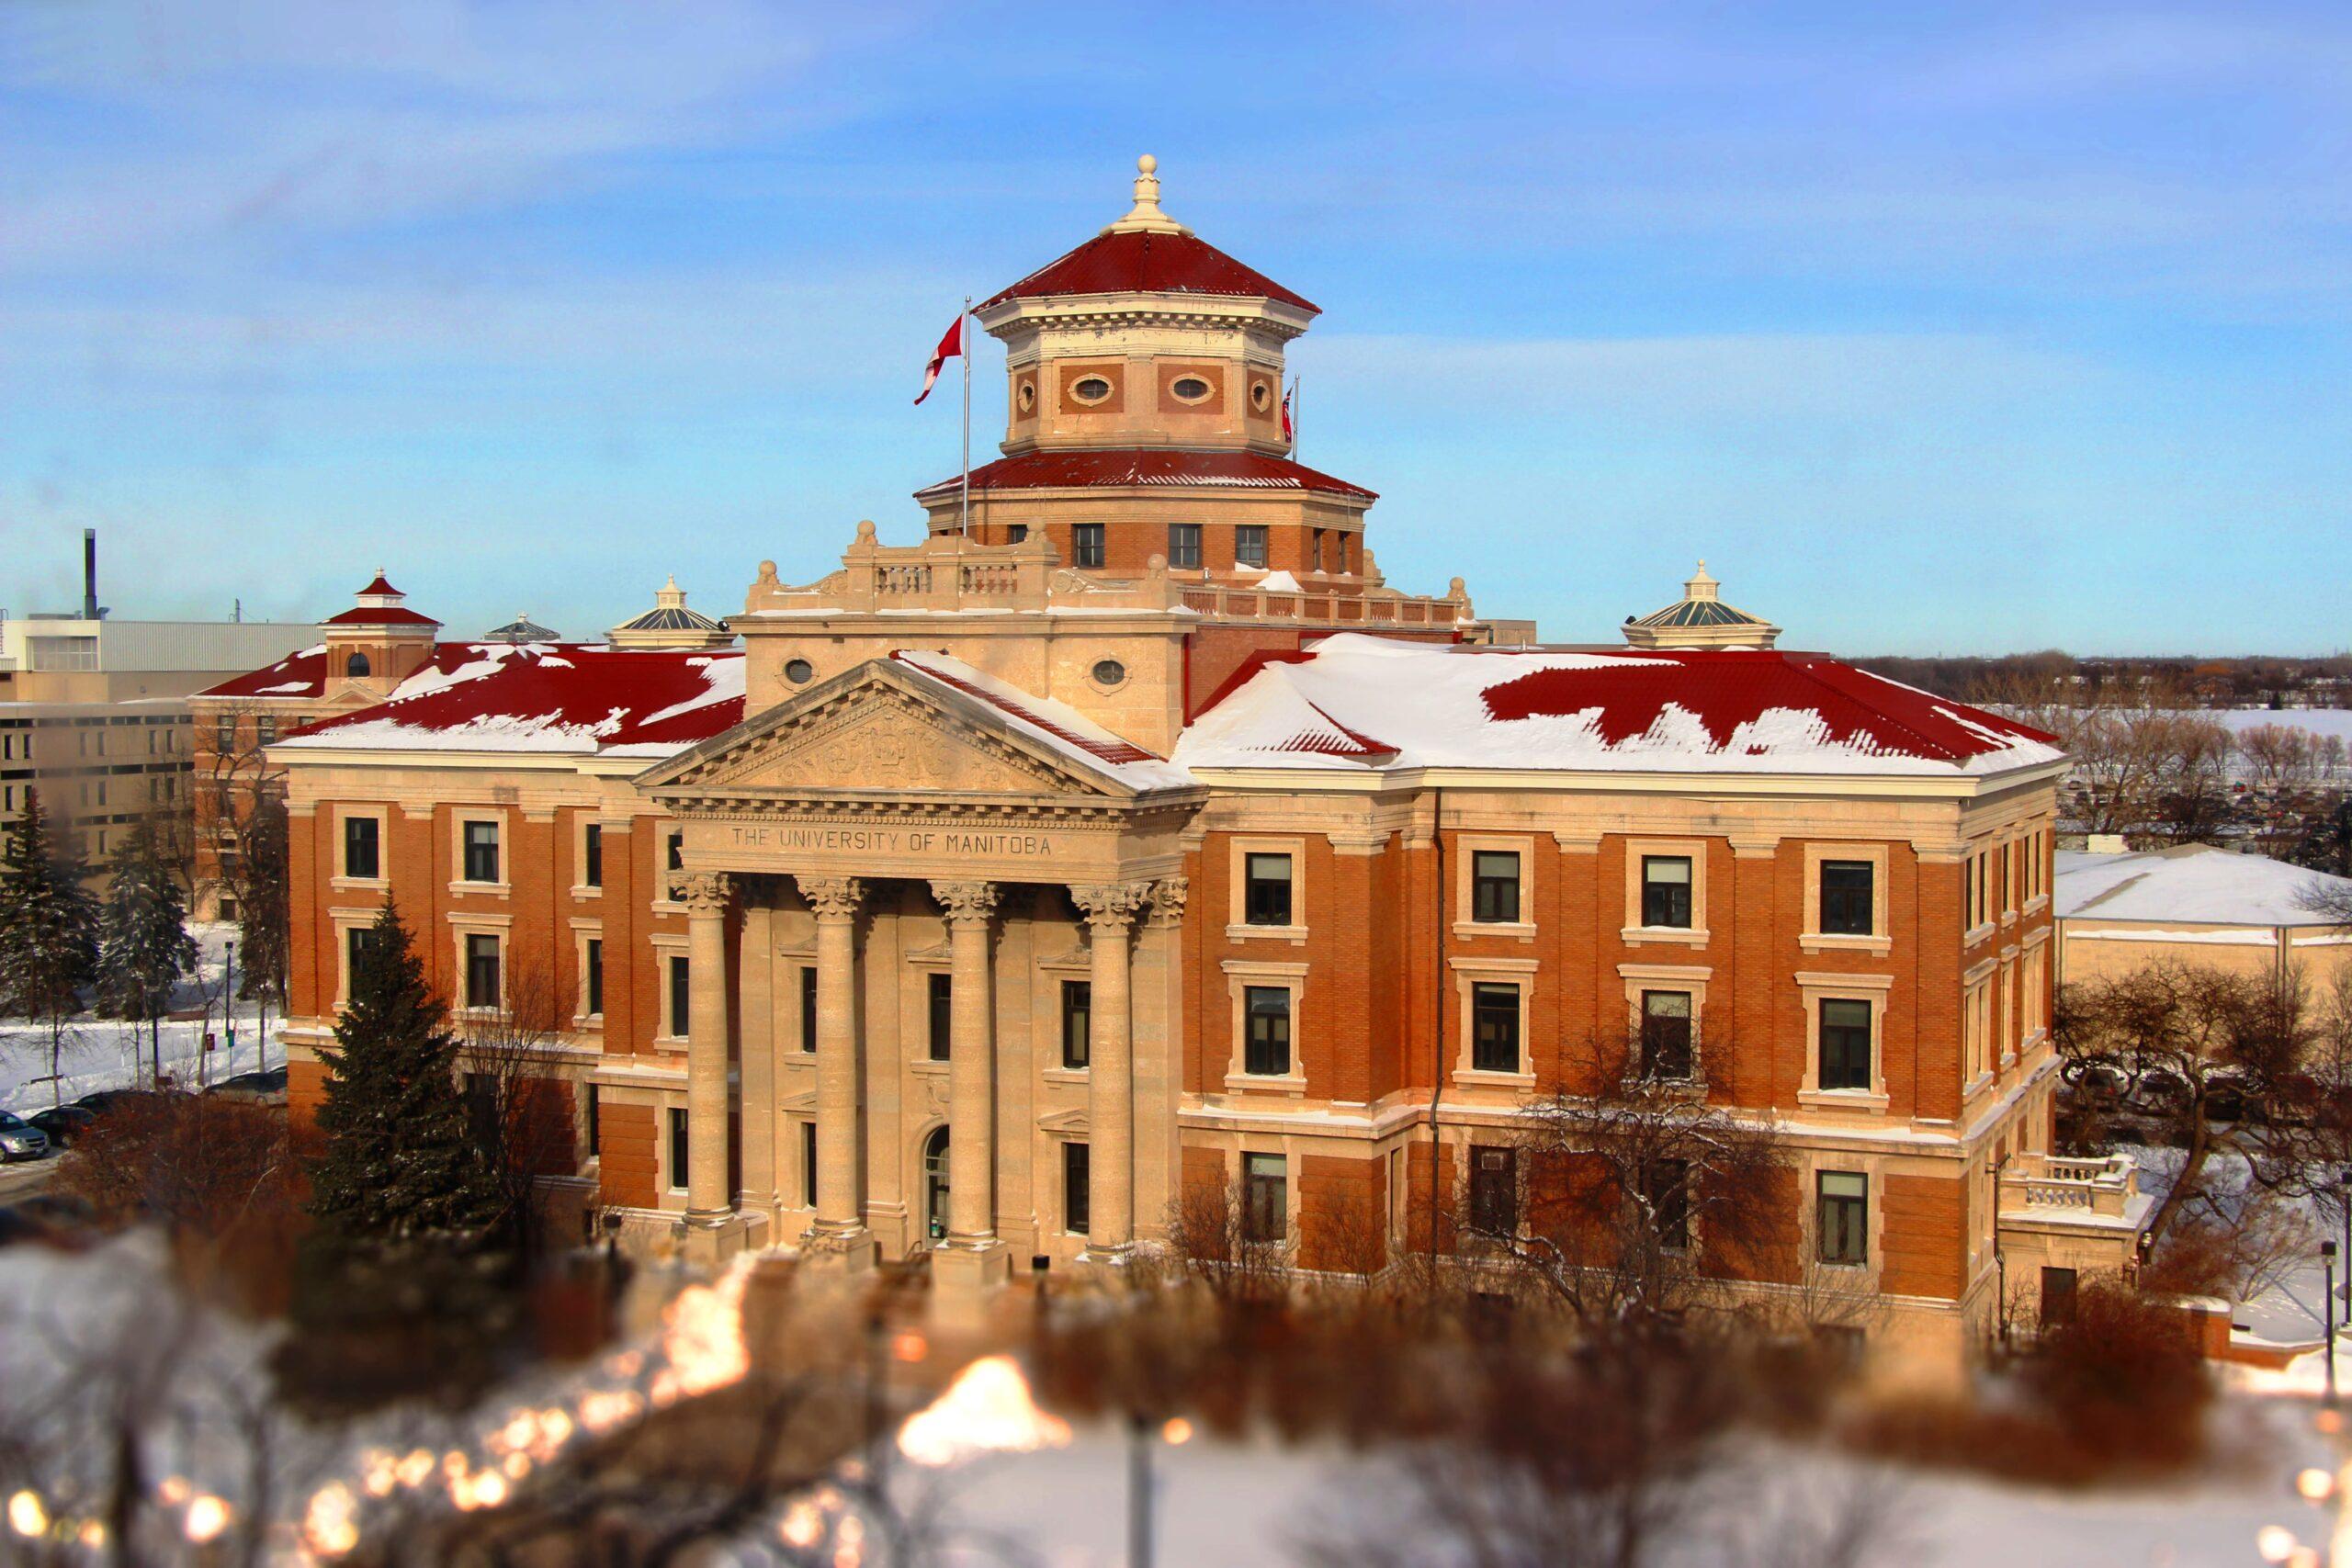 Conheça o programa University of Manitoba Graduate Fellowship